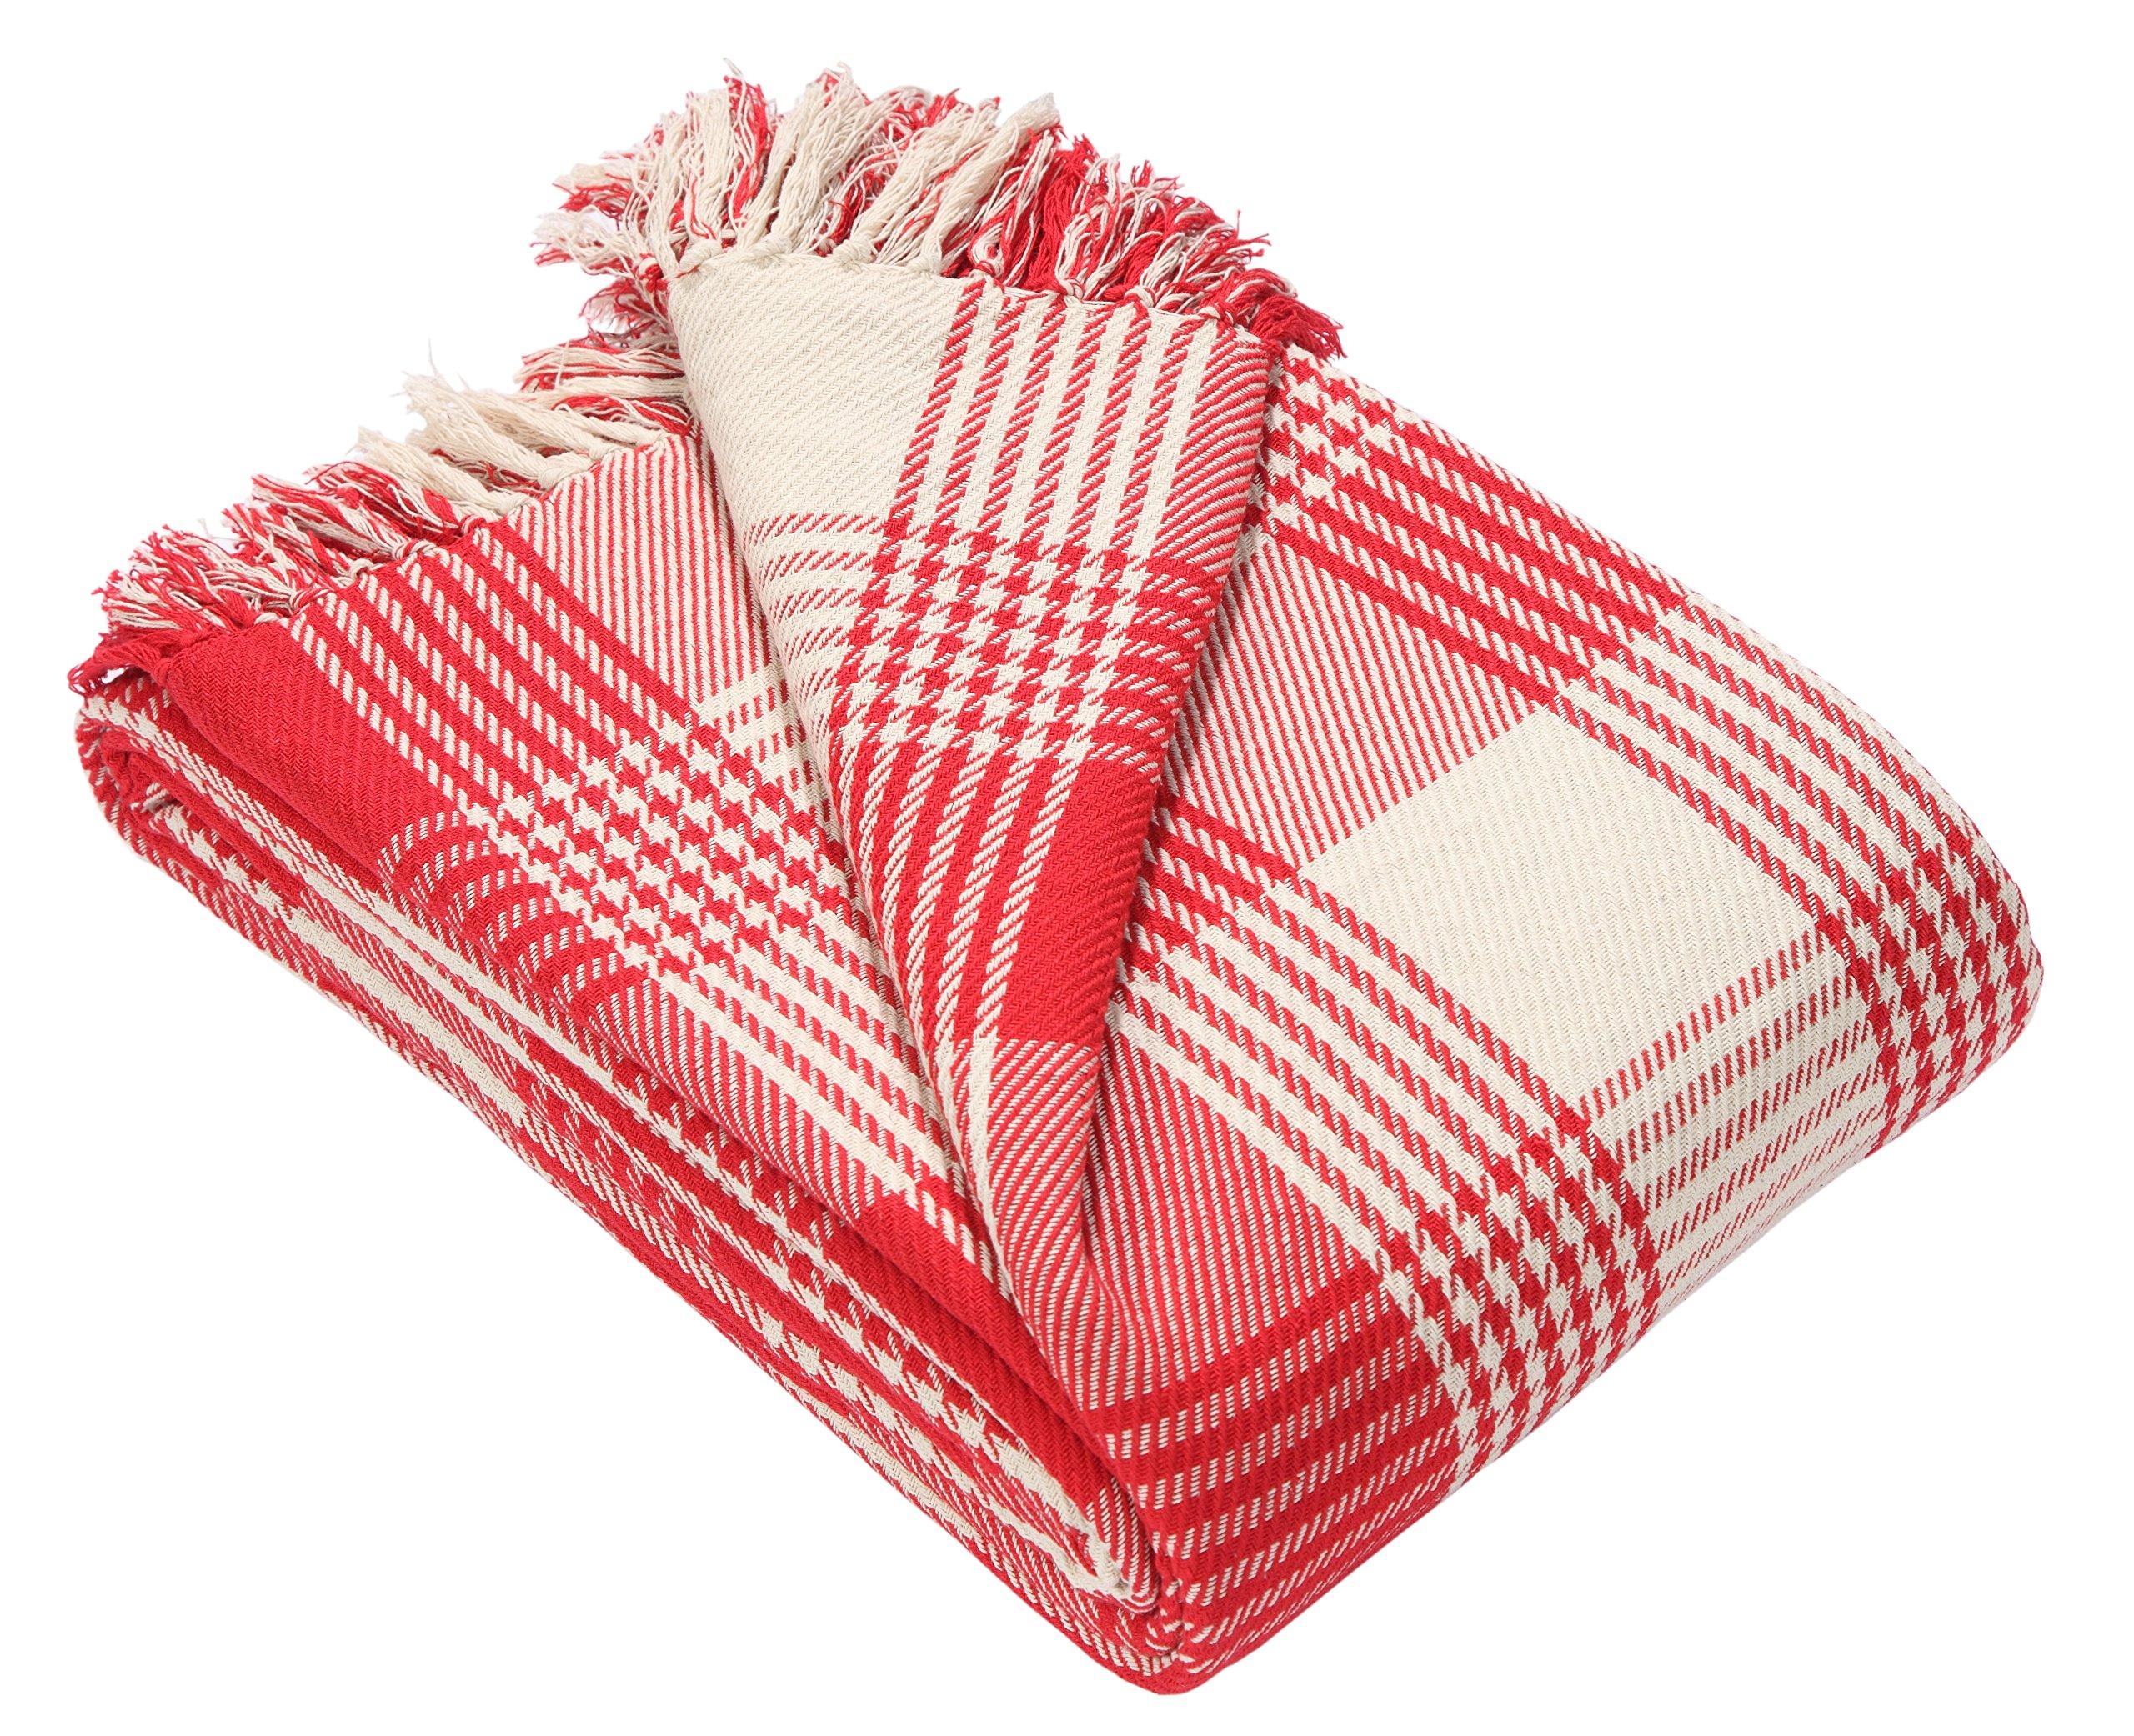 red throws for sofas amazon co uk rh amazon co uk  buy throws for sofas